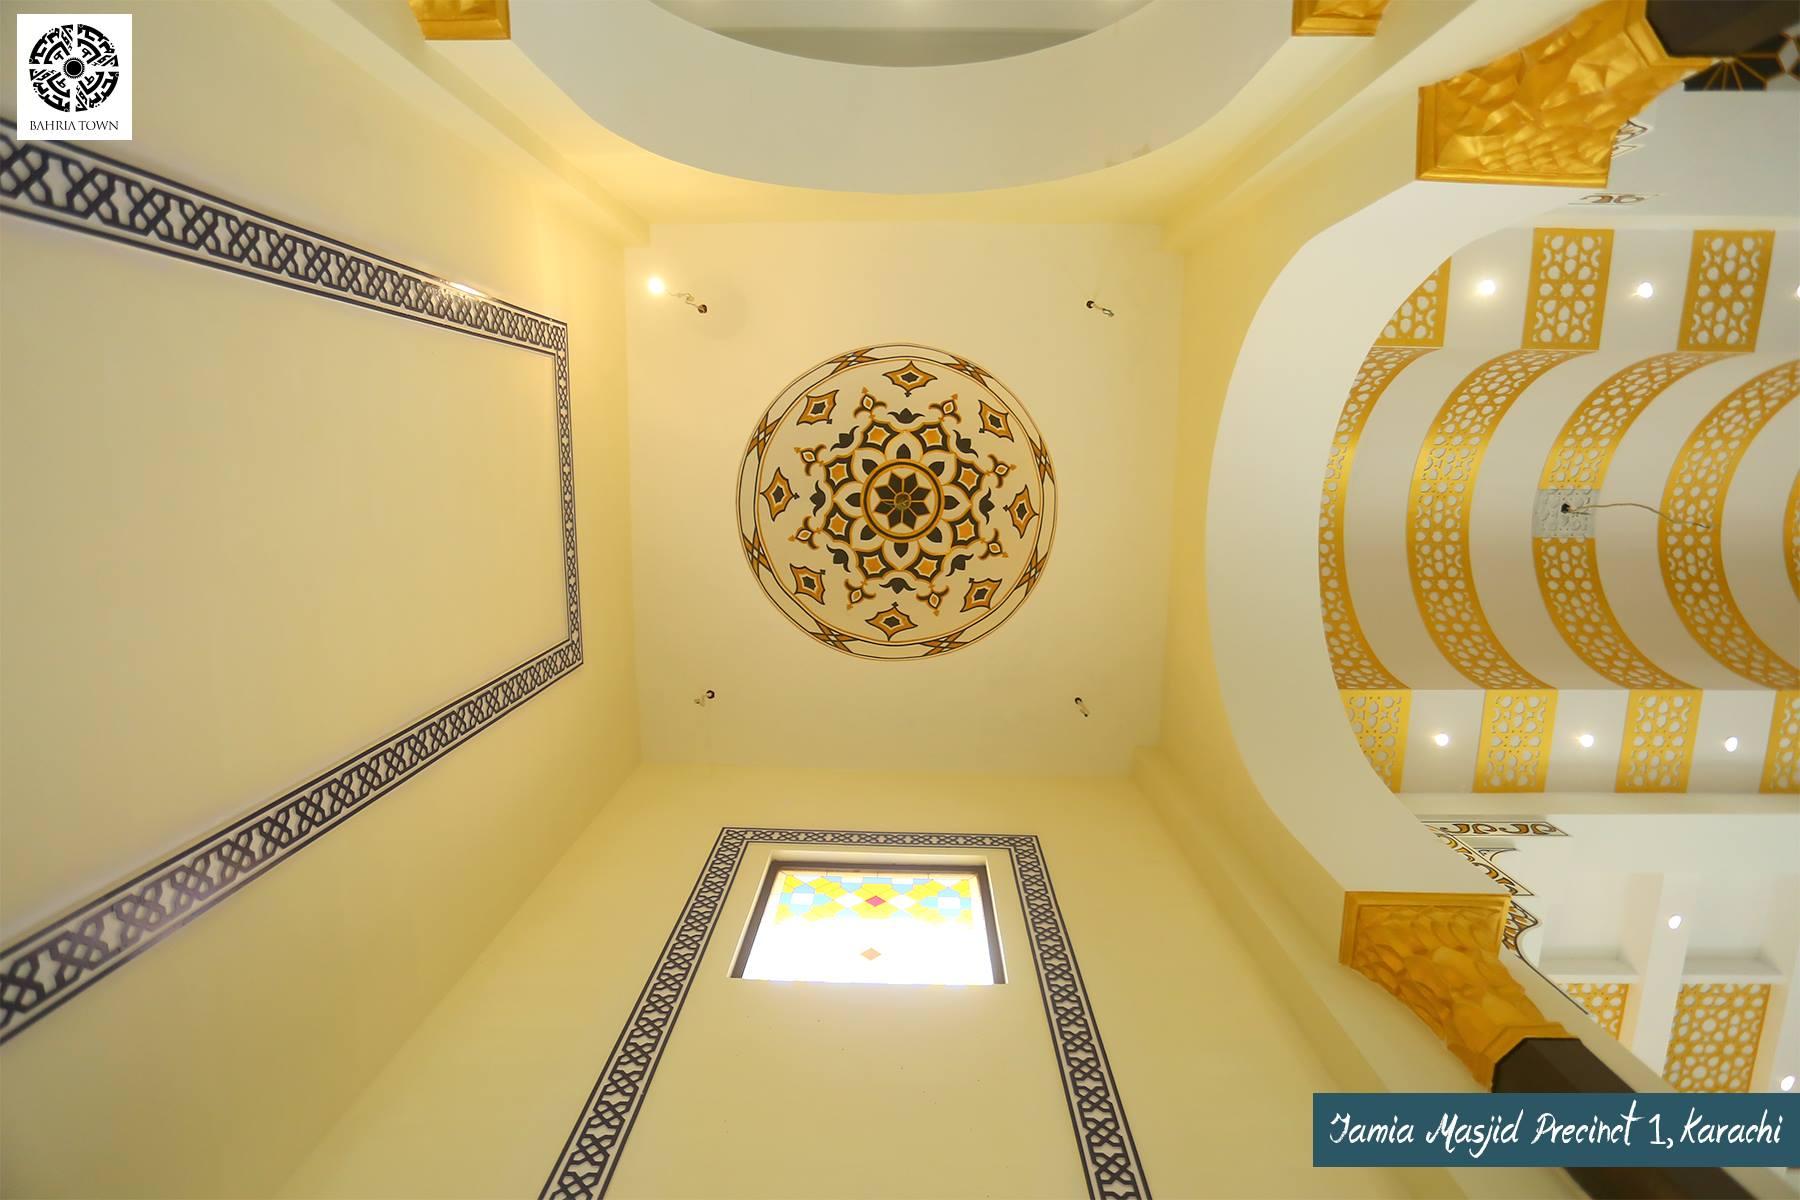 Jamia Masjid – Precinct 1 Bahria Town Karachi6